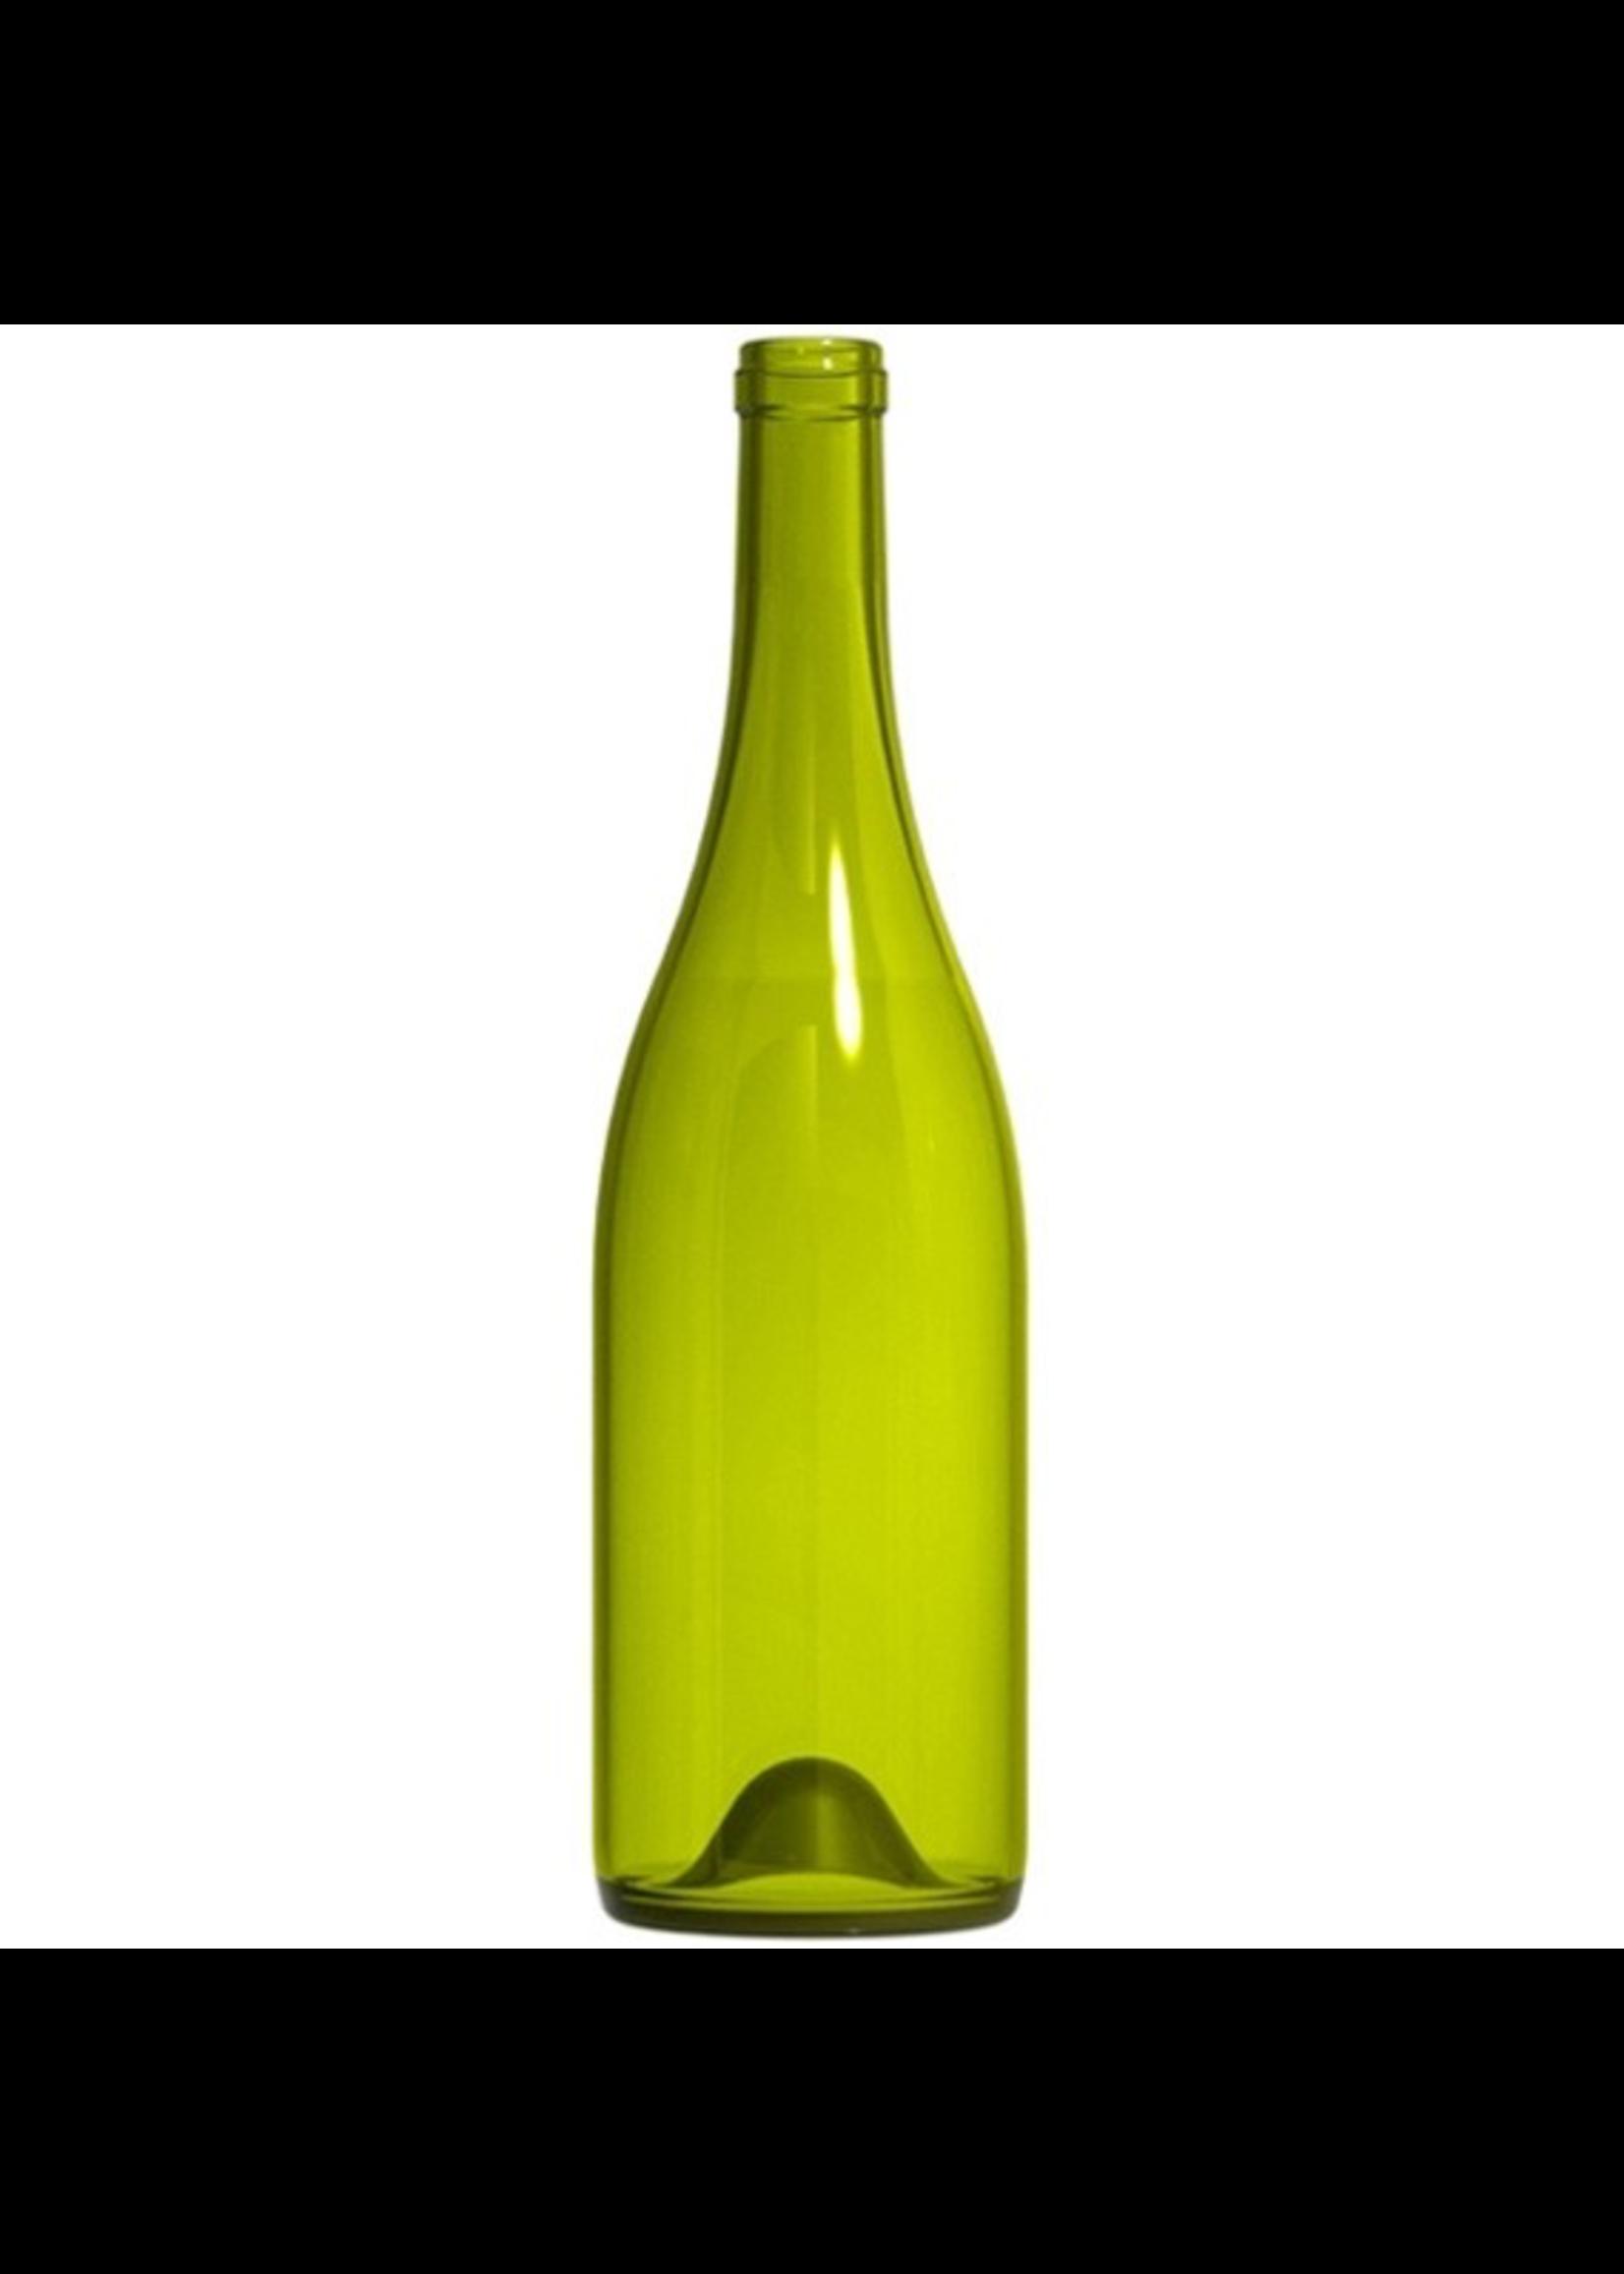 Racking/Bottling Bottles, Wine - 750 ml Burgundy Punted - Dead Leaf Green (12/case)